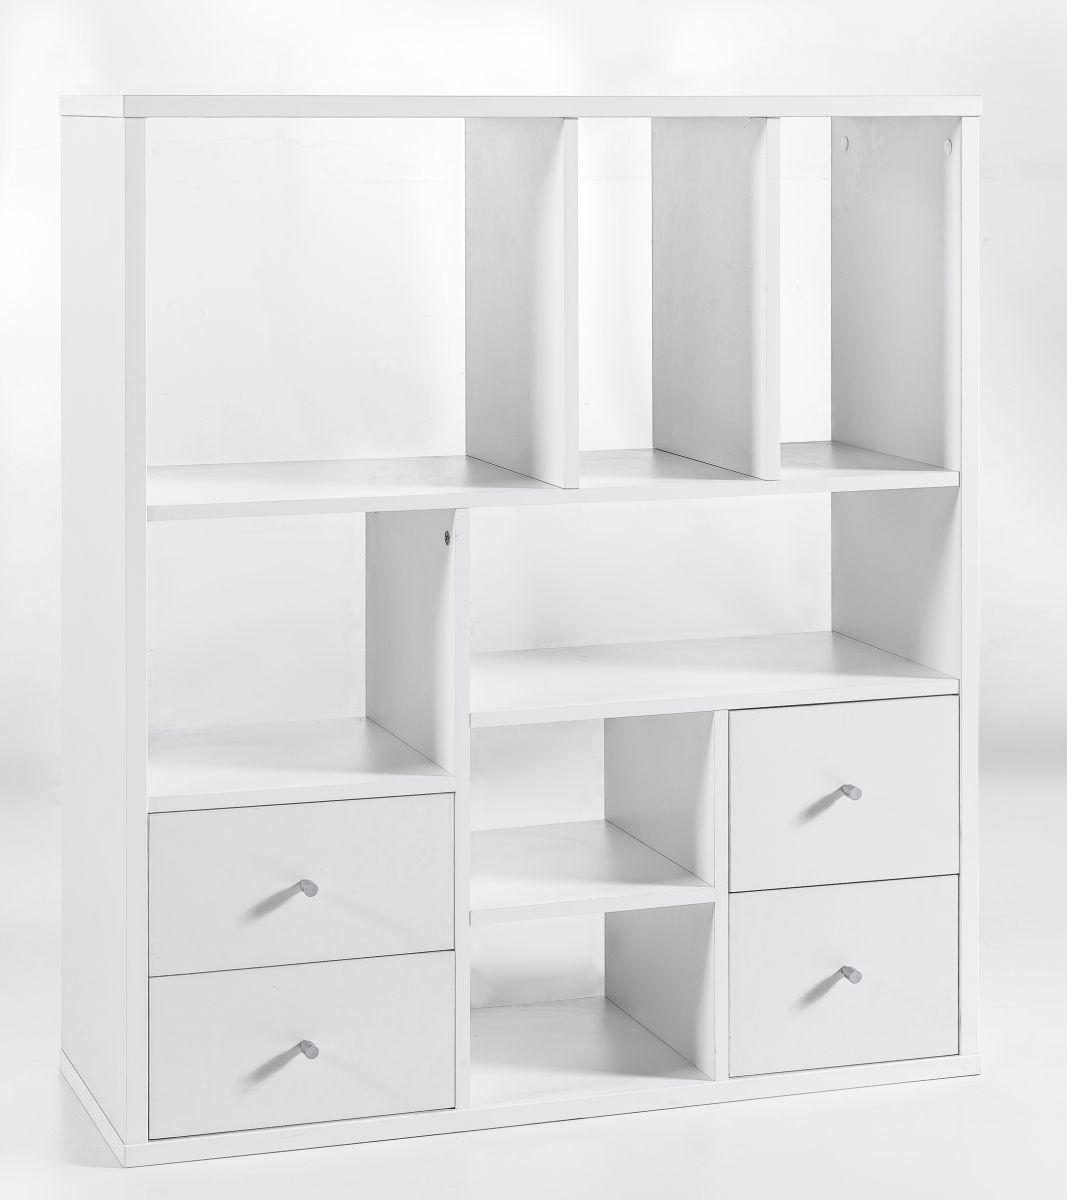 regale b cherregale raumteiler serie base wei div gr en. Black Bedroom Furniture Sets. Home Design Ideas